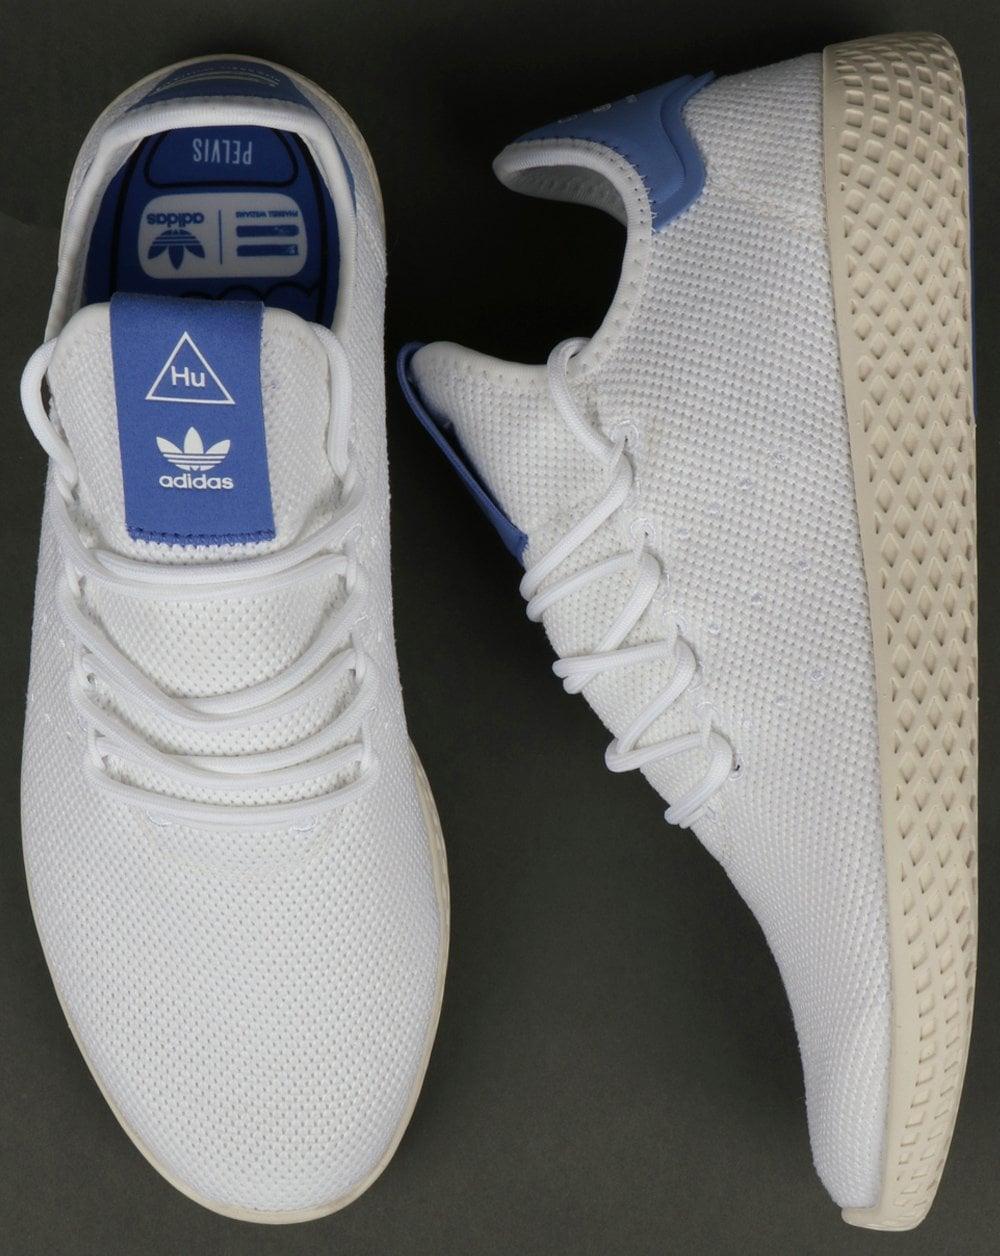 Adidas PW Tennis HU Trainers White,Blue